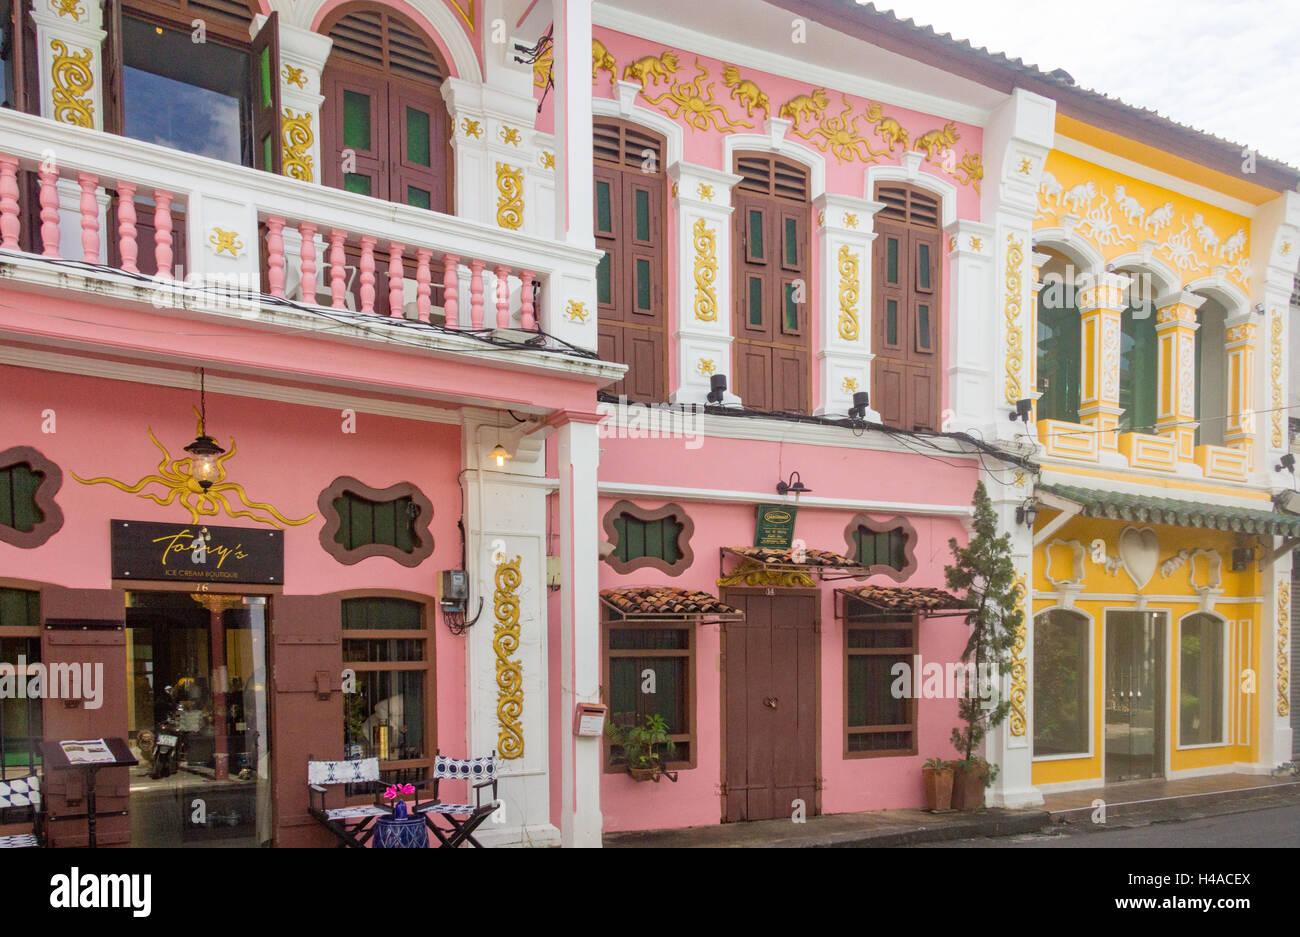 Restored Sino portuguese architecture on Soi Romanee in old Phuket Town, Thailand Stock Photo